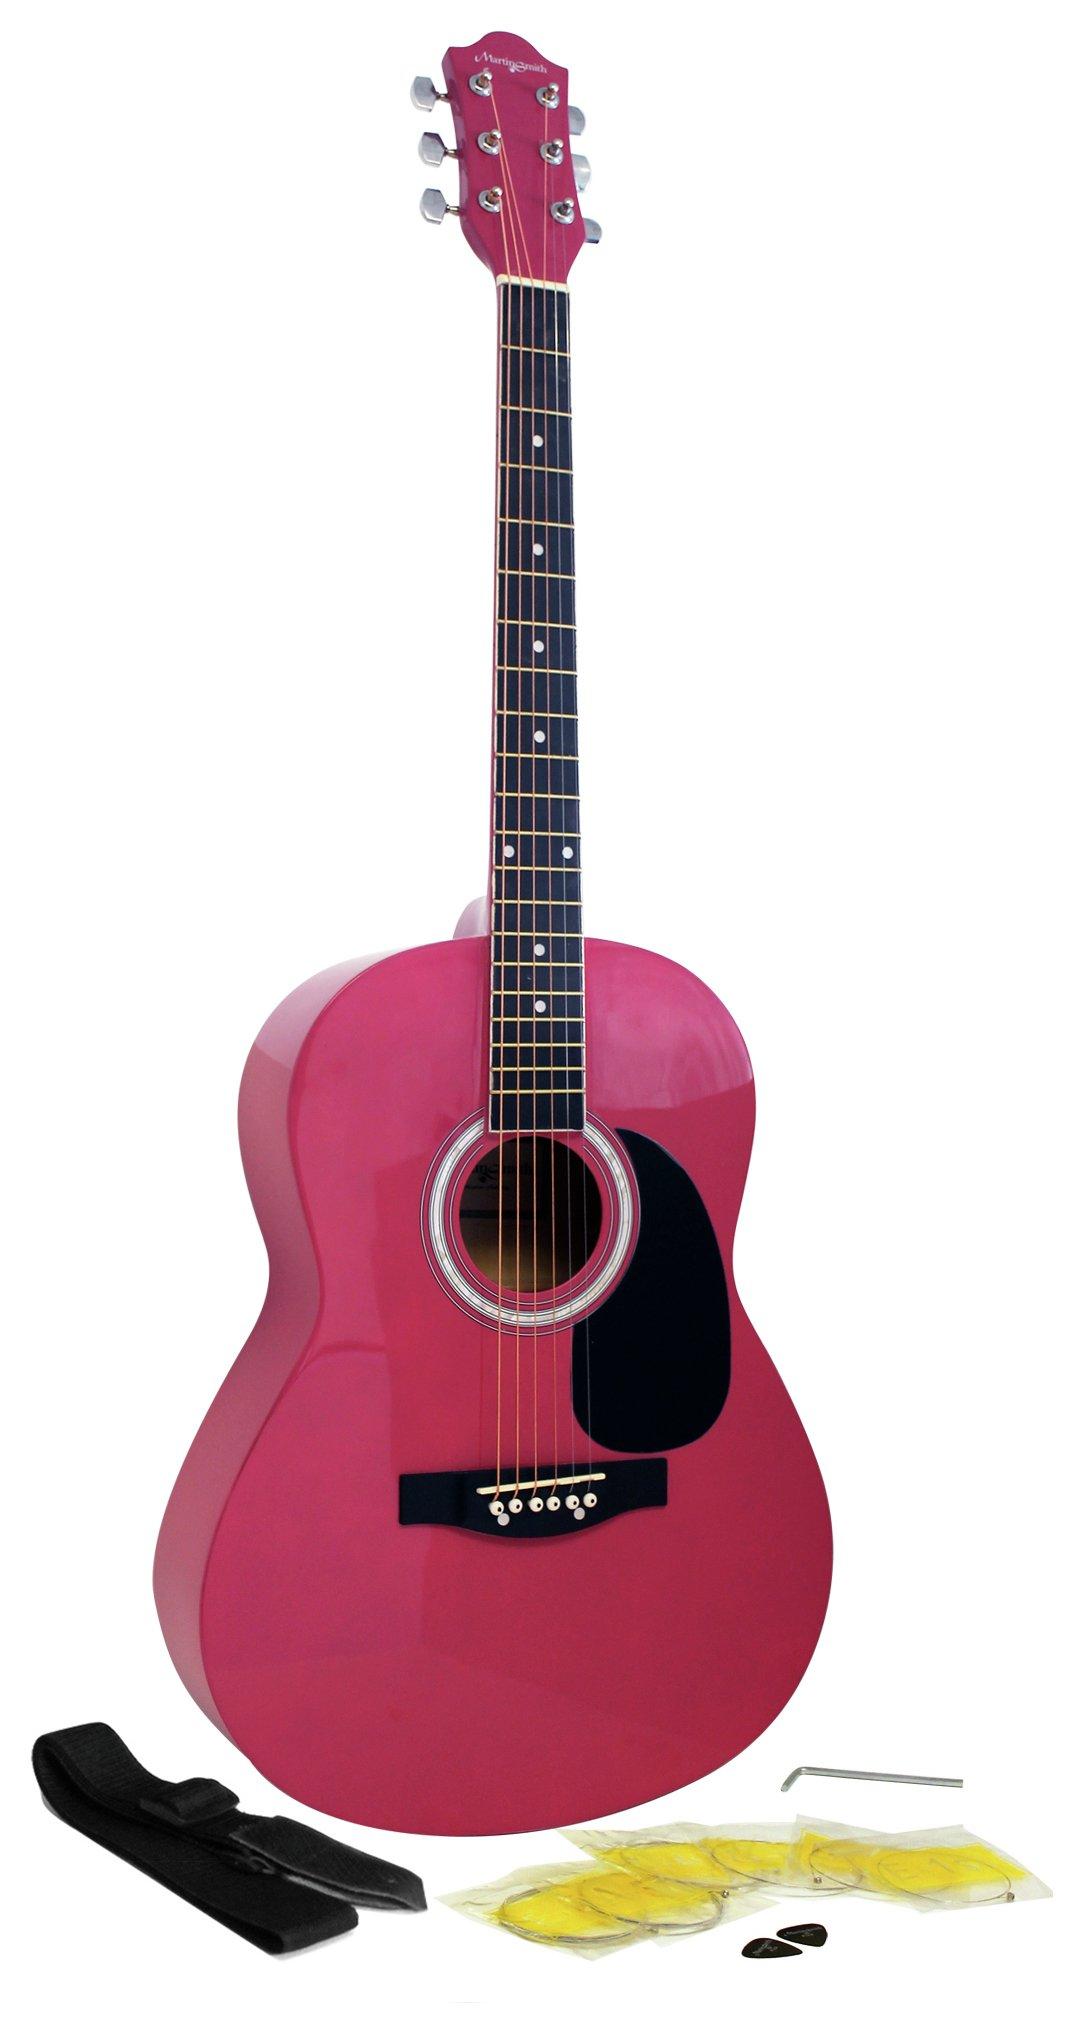 Martin Smith Full Size Acoustic Guitar Pink 5710986 Argos Price Tracker Pricehistory Co Uk